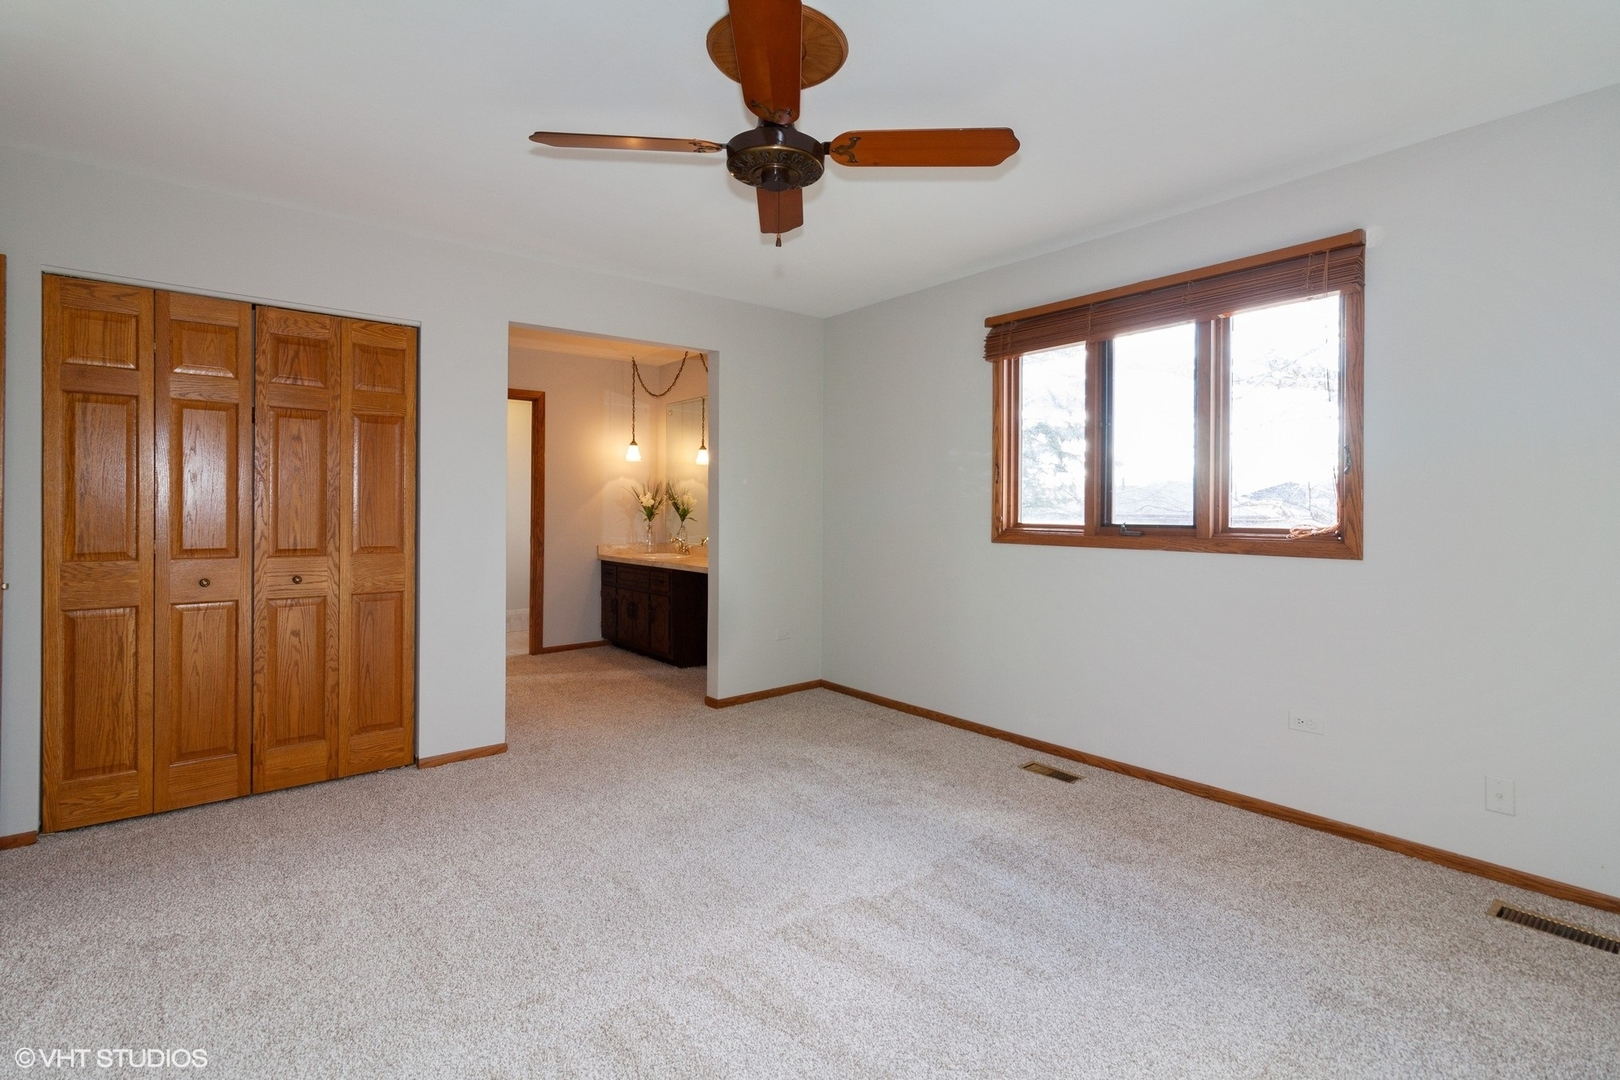 12556 West Morgan, Homer Glen, Illinois, 60491